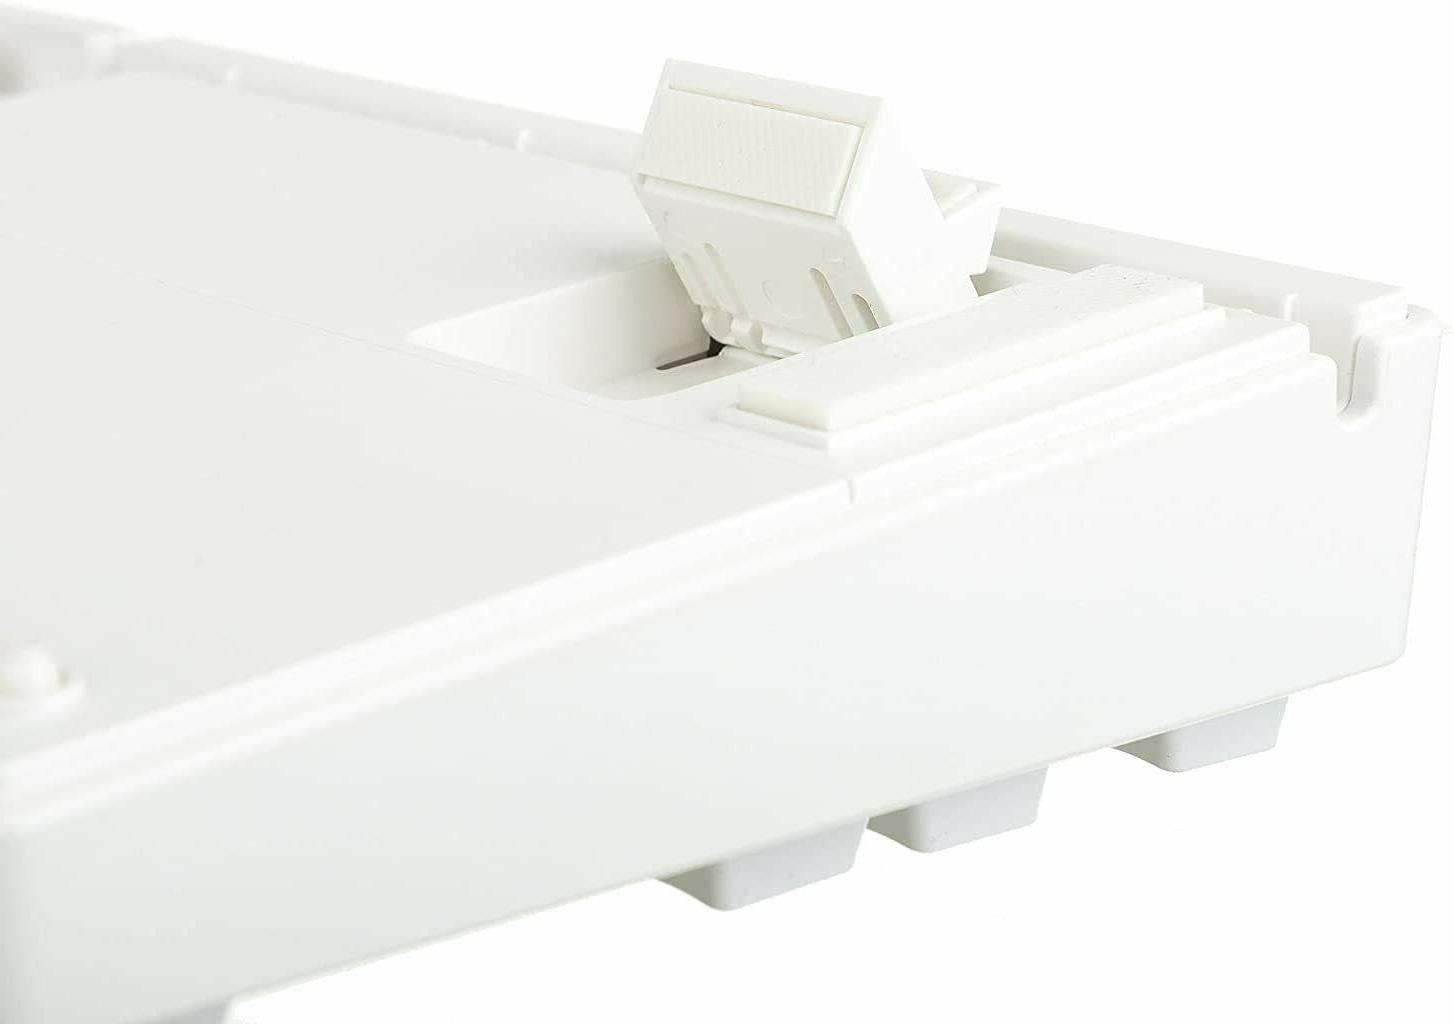 iKBC RGB Backlit Mechanical Cherry MX Keyboards